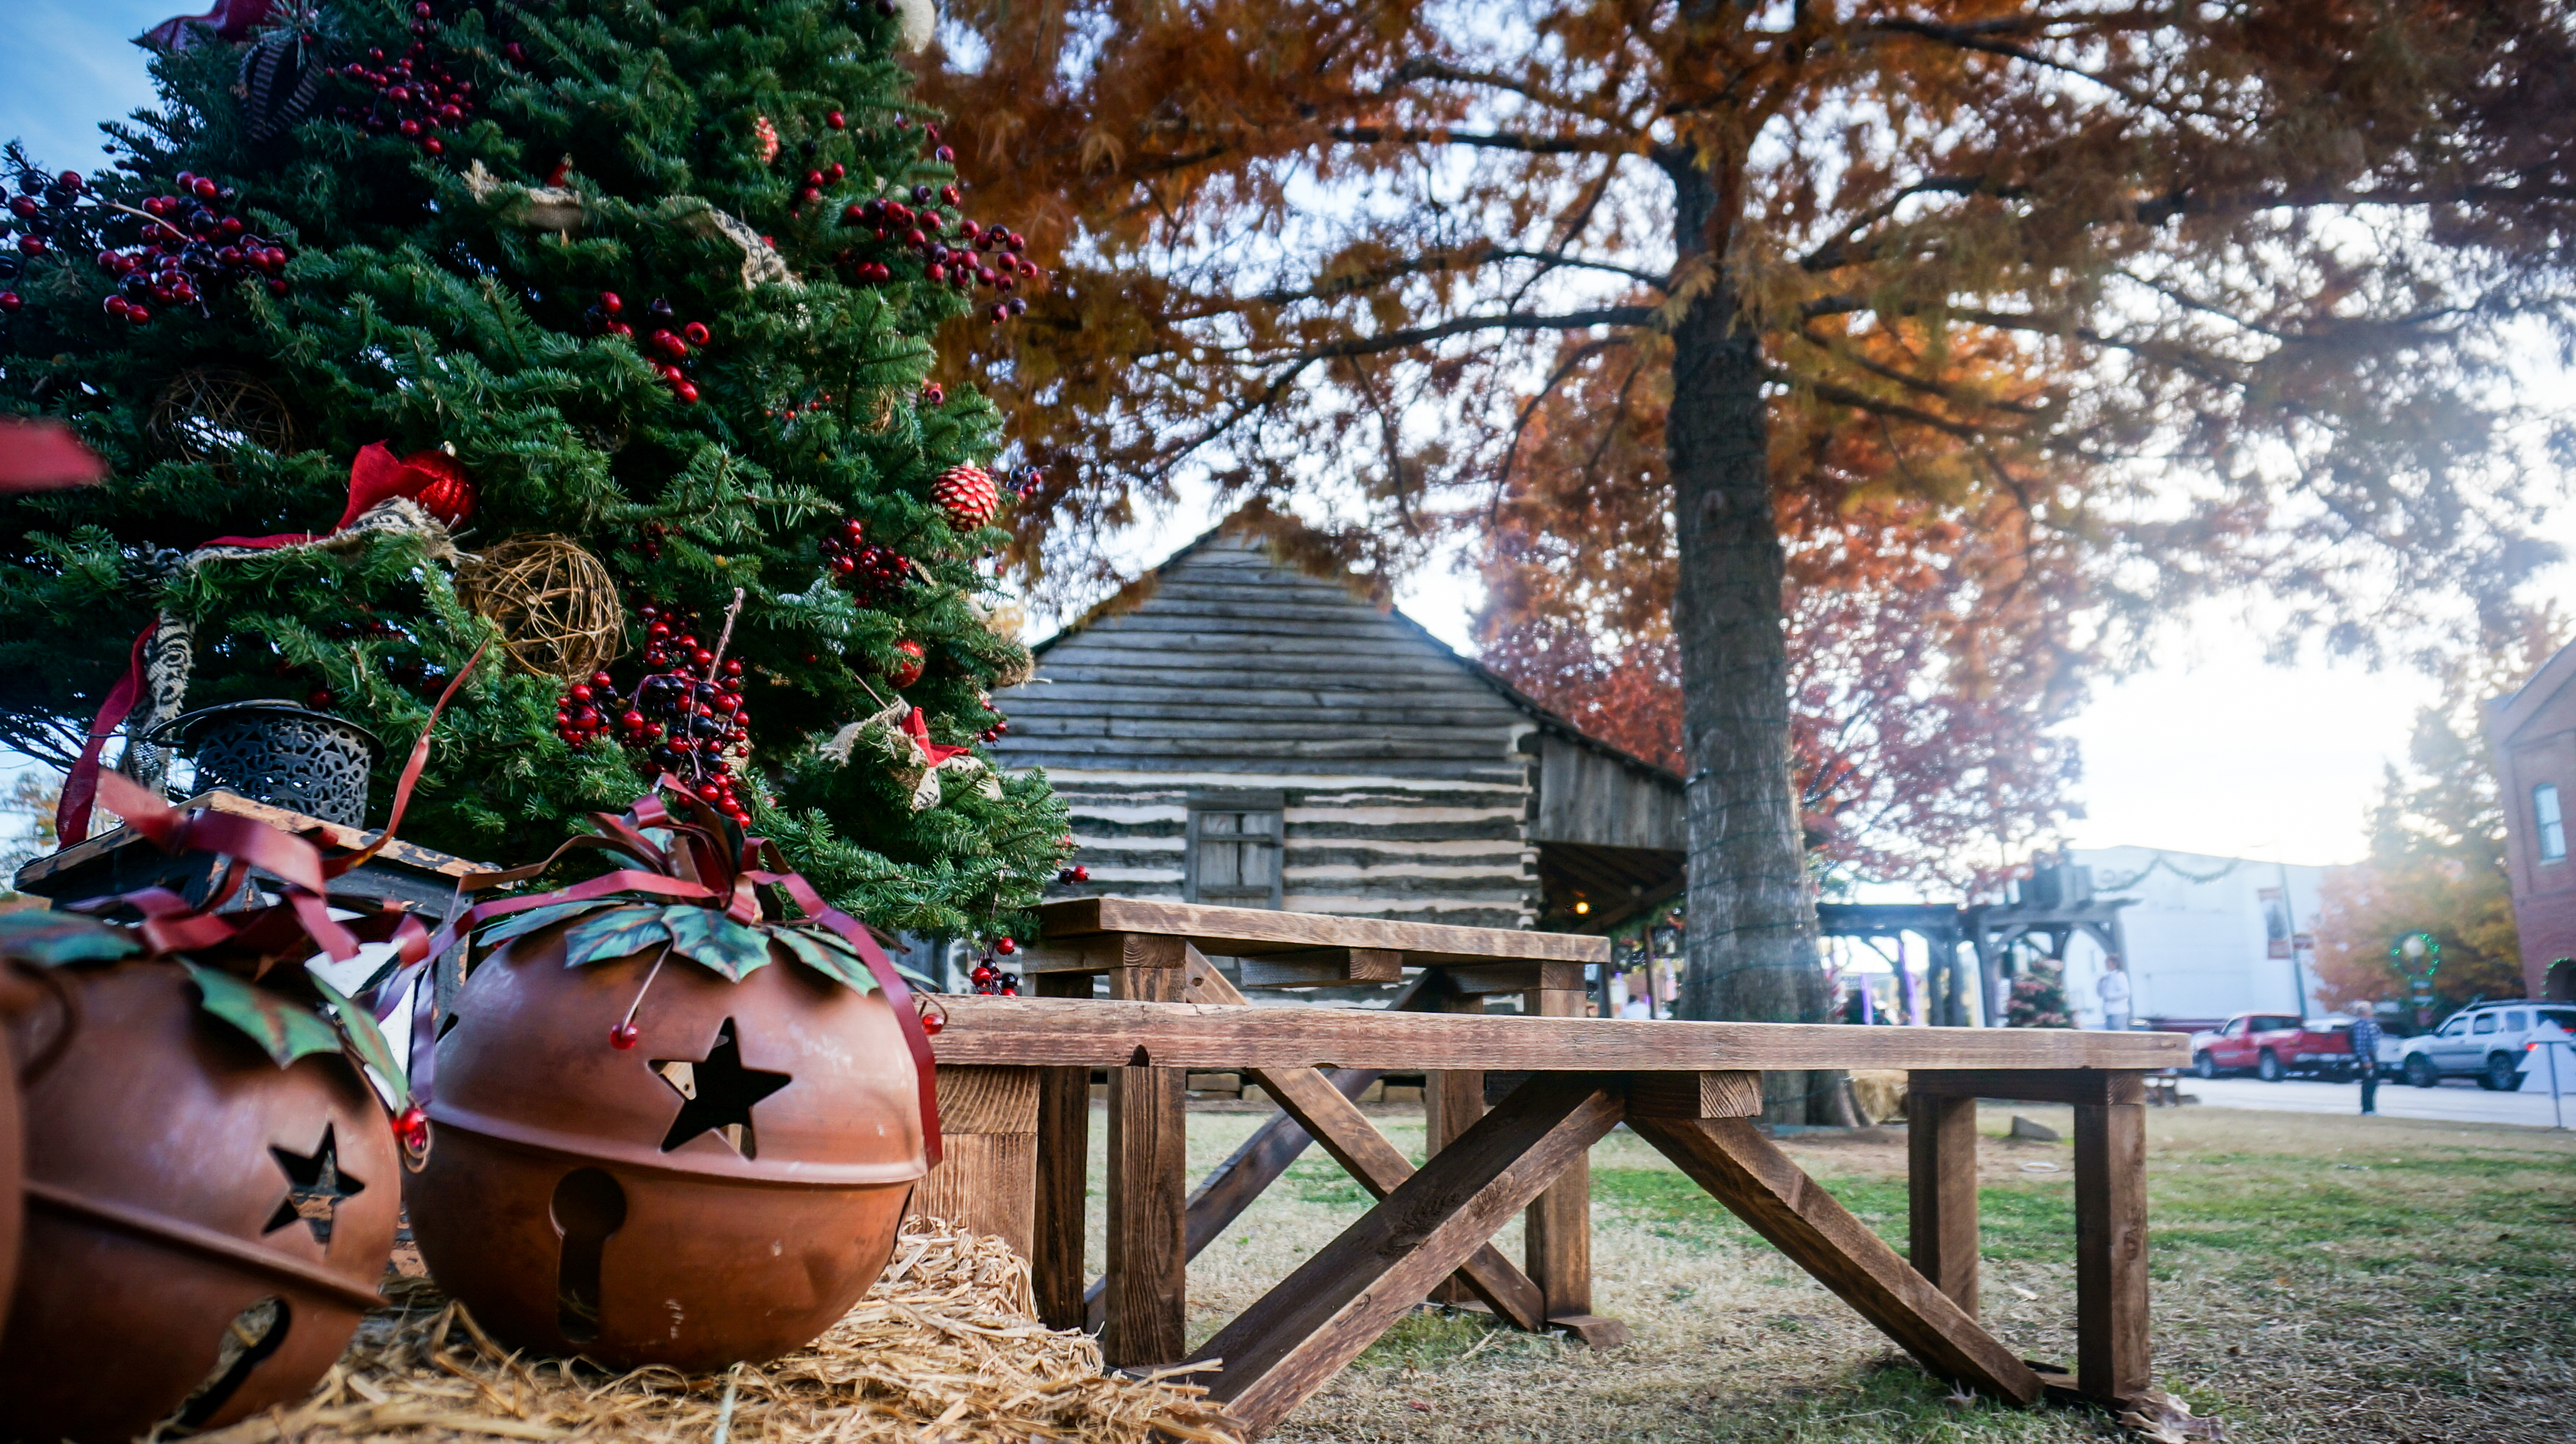 Holiday Photo Fun at Torian Cabin